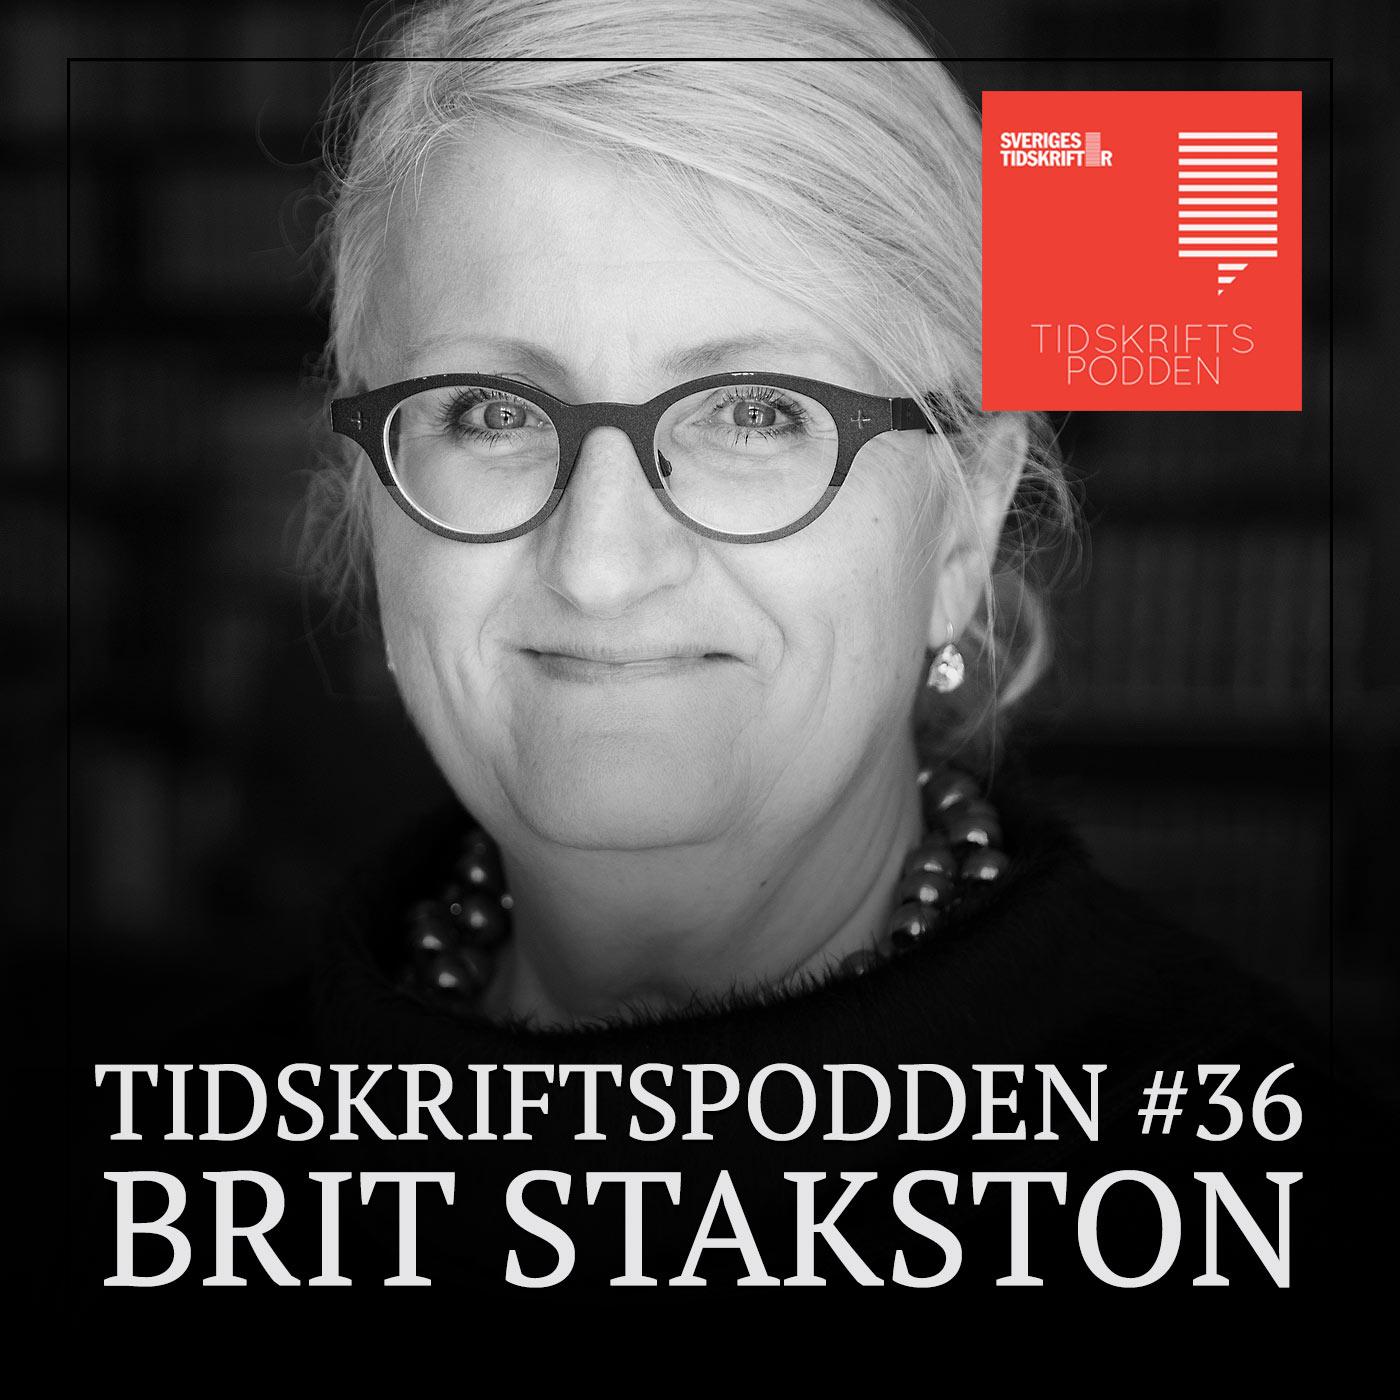 Brit Stakston Tidskriftspodden avsnitt 36